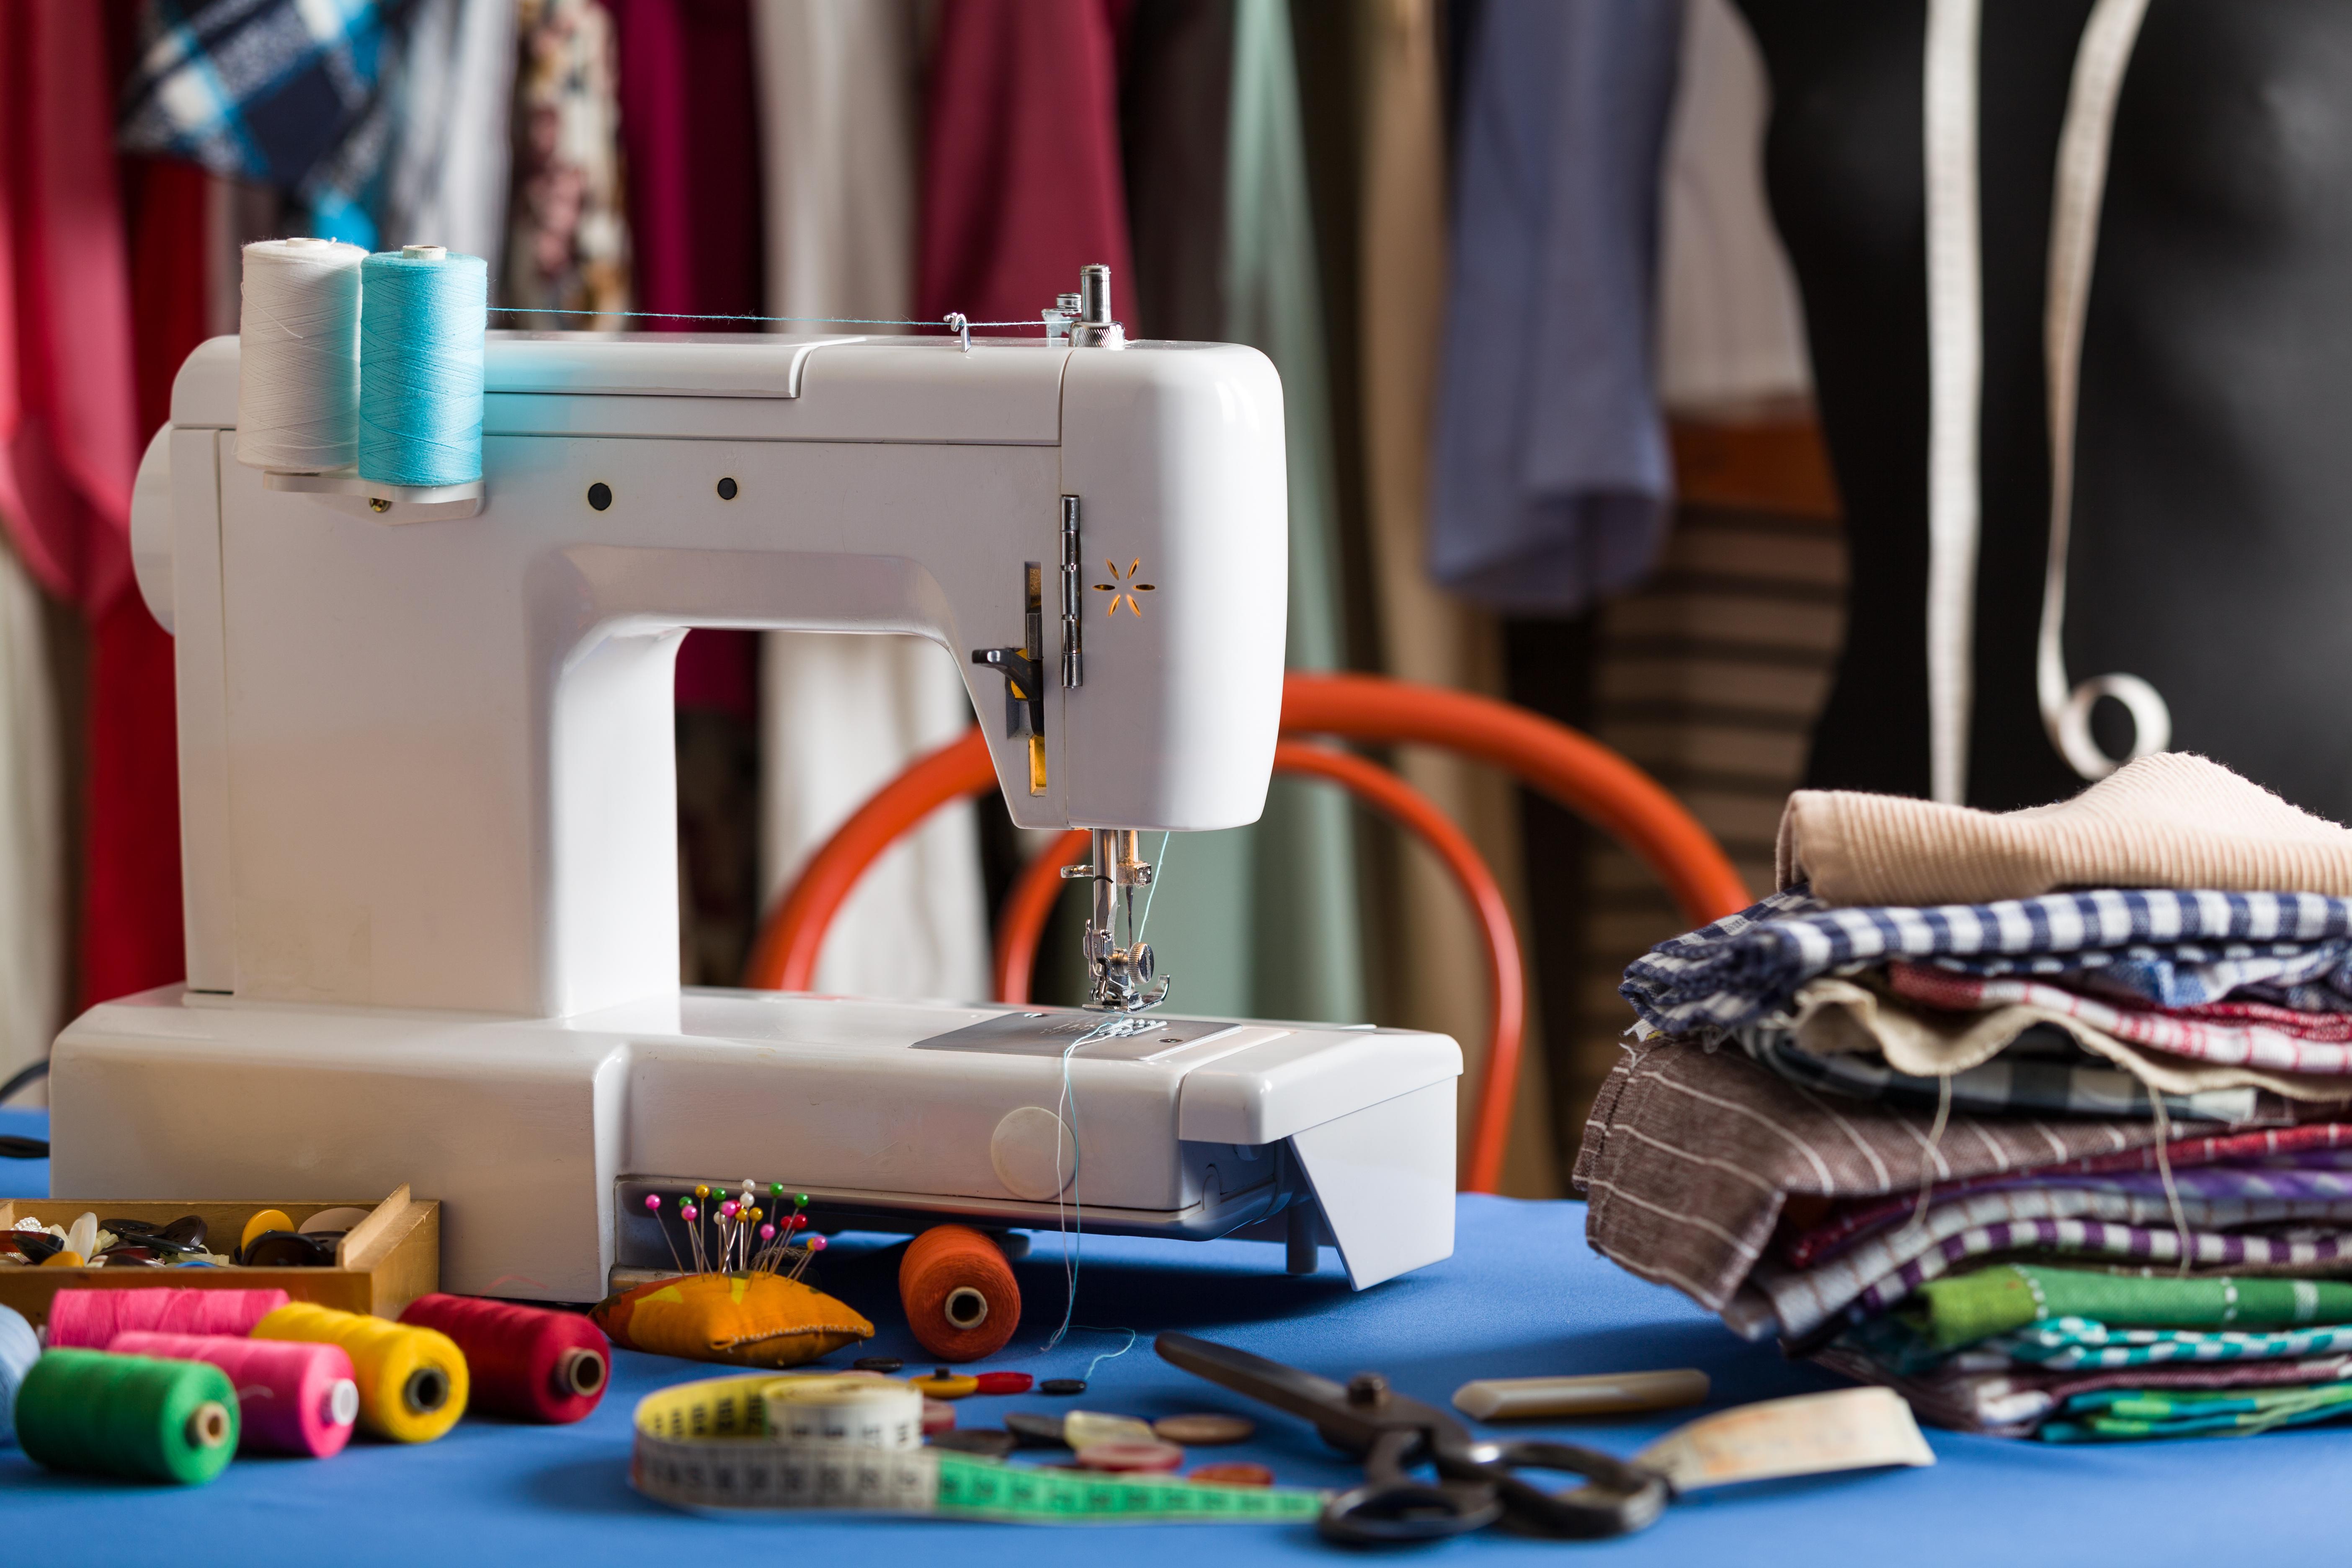 Kitchener sewing machine store Advanced Sewing Machine Repairs & Sales